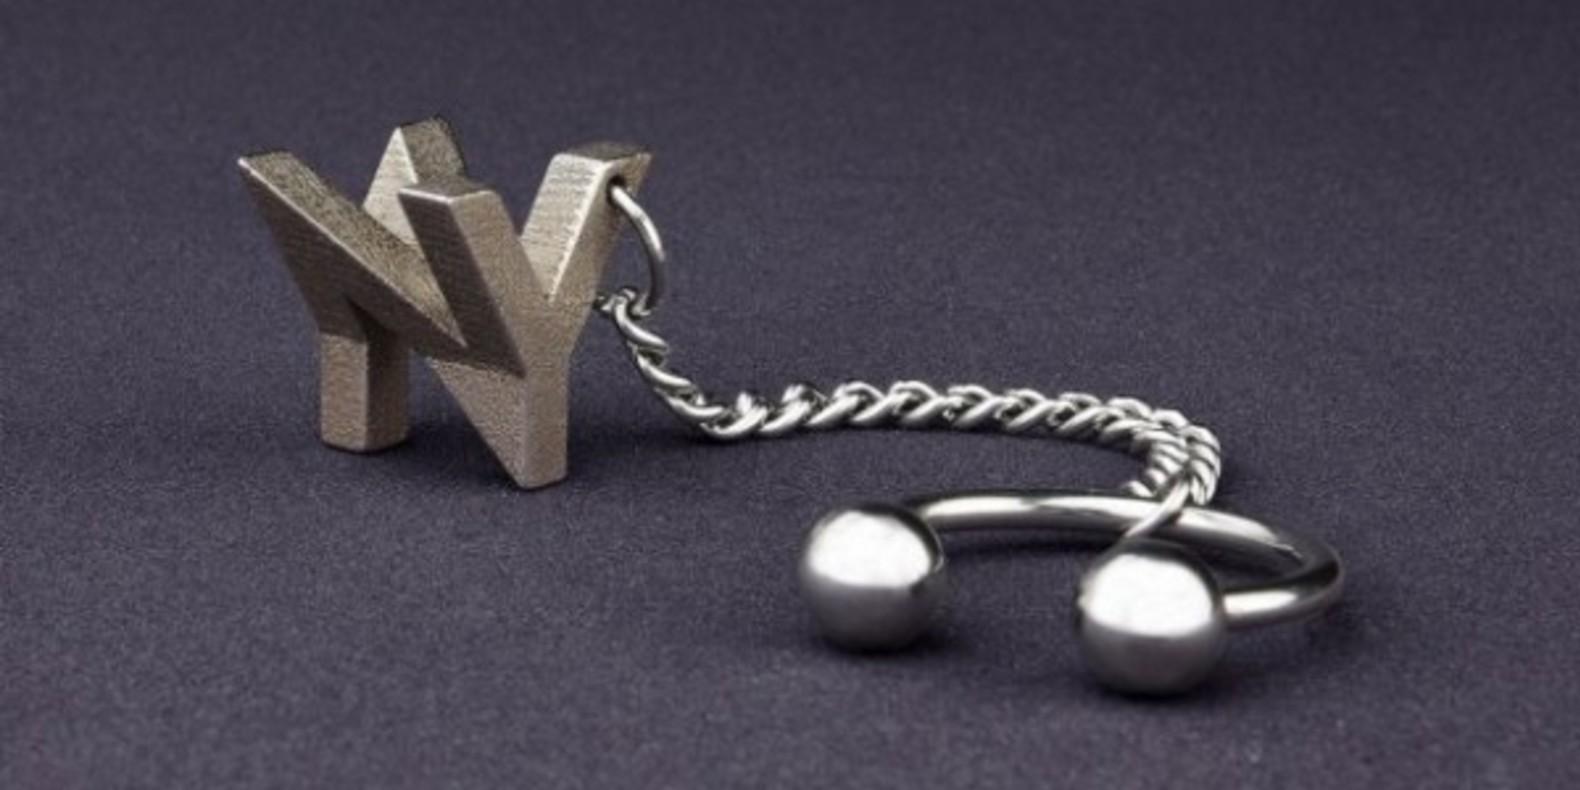 mymo monogramme en bijou impression 3D cults fichier 3D ultravigo pendentif collier